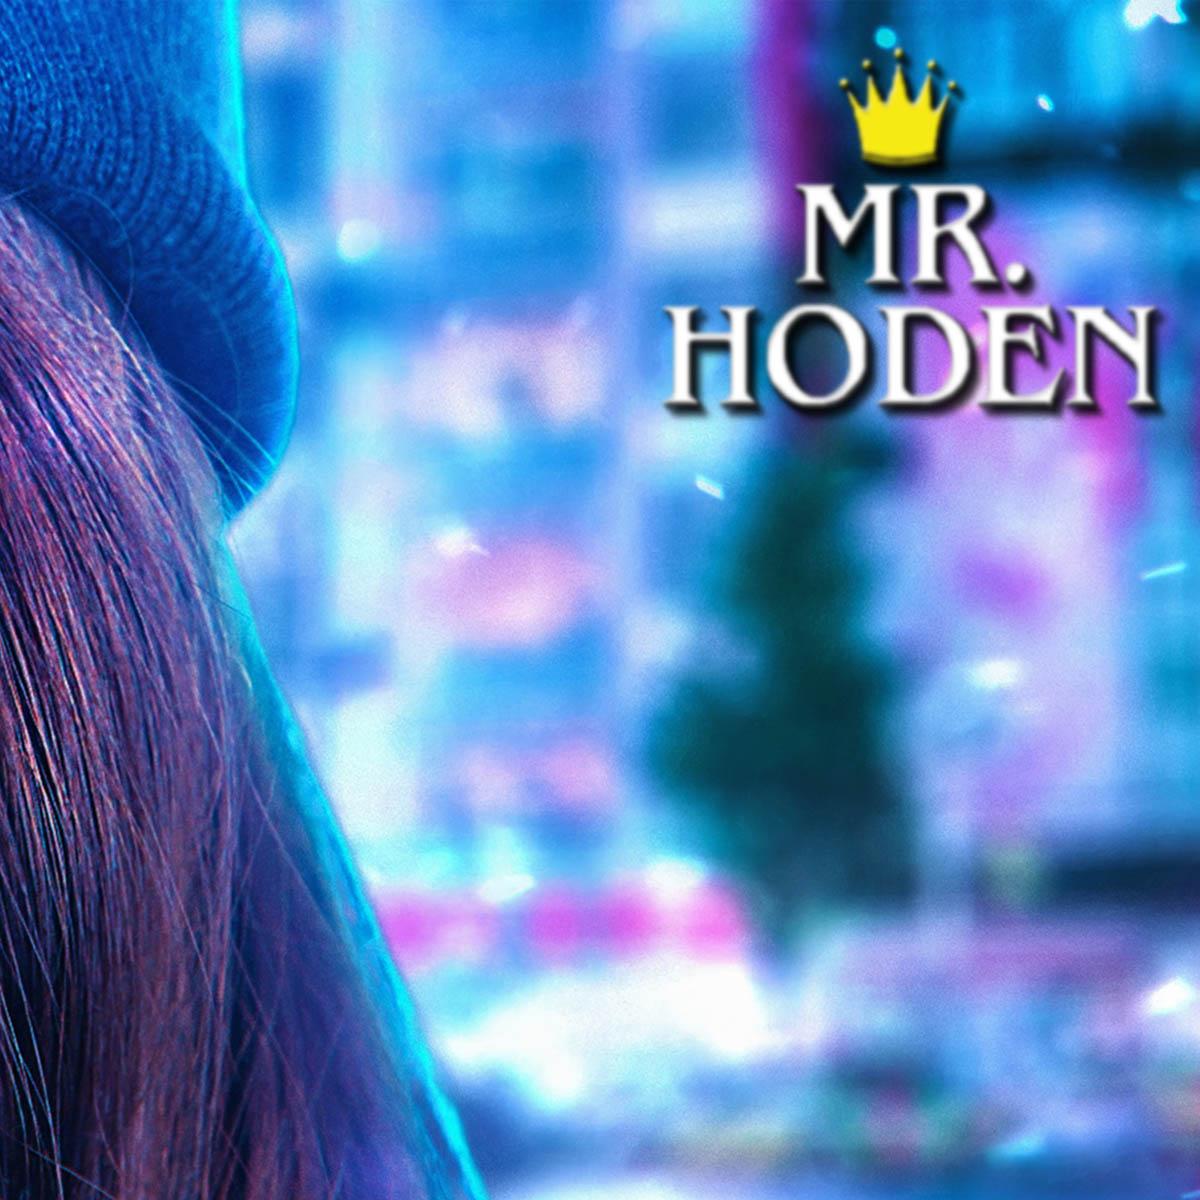 Upcoming: Mr. Hoden - Banger Freestyle Rap Beat [FREE BEAT]